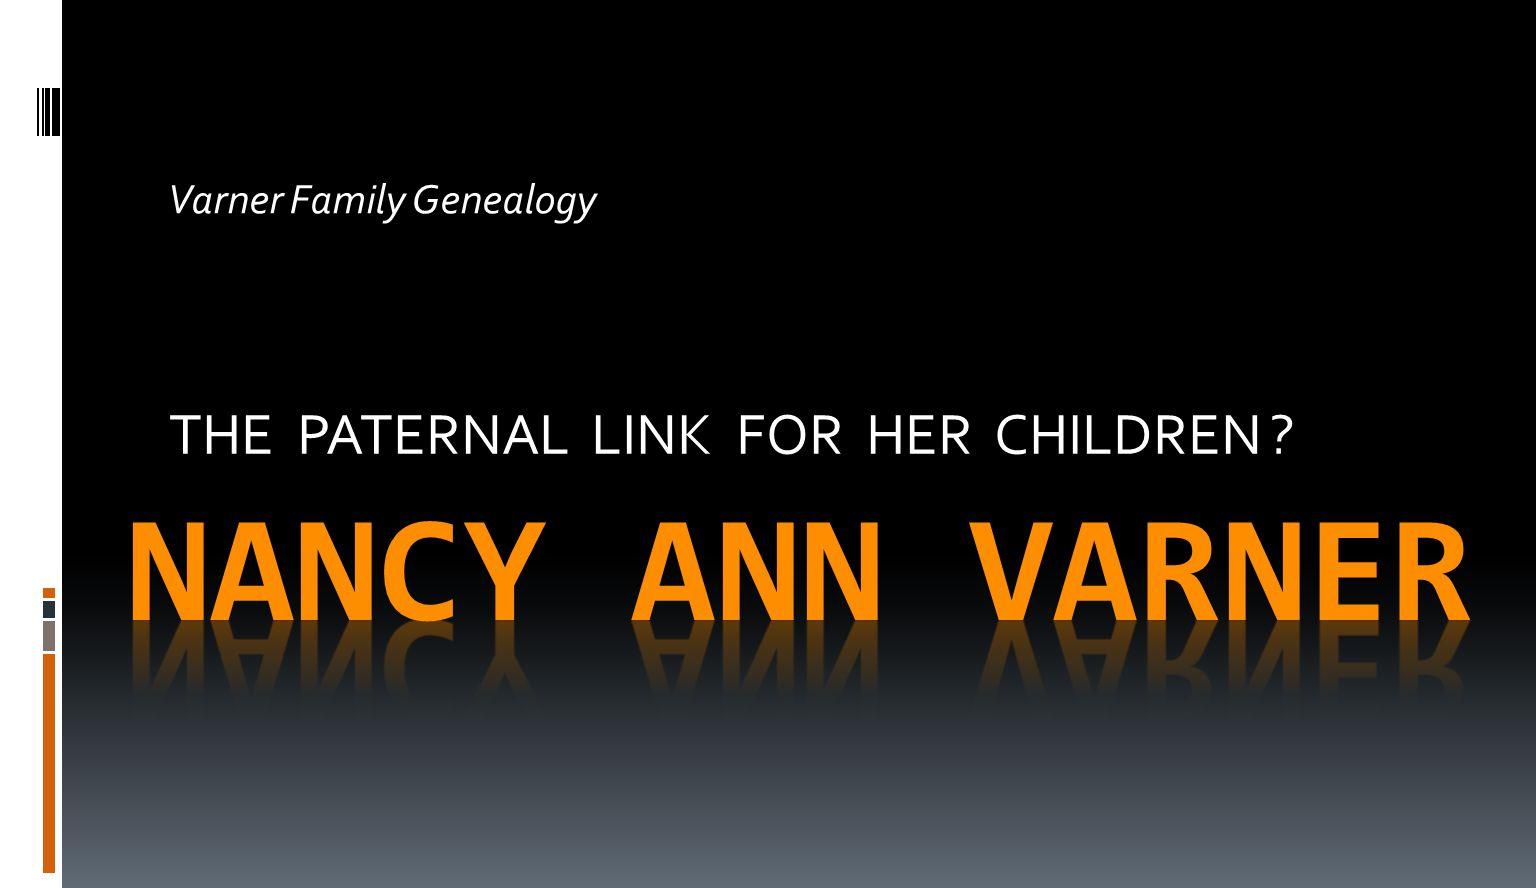 THE PATERNAL LINK FOR HER CHILDREN Varner Family Genealogy